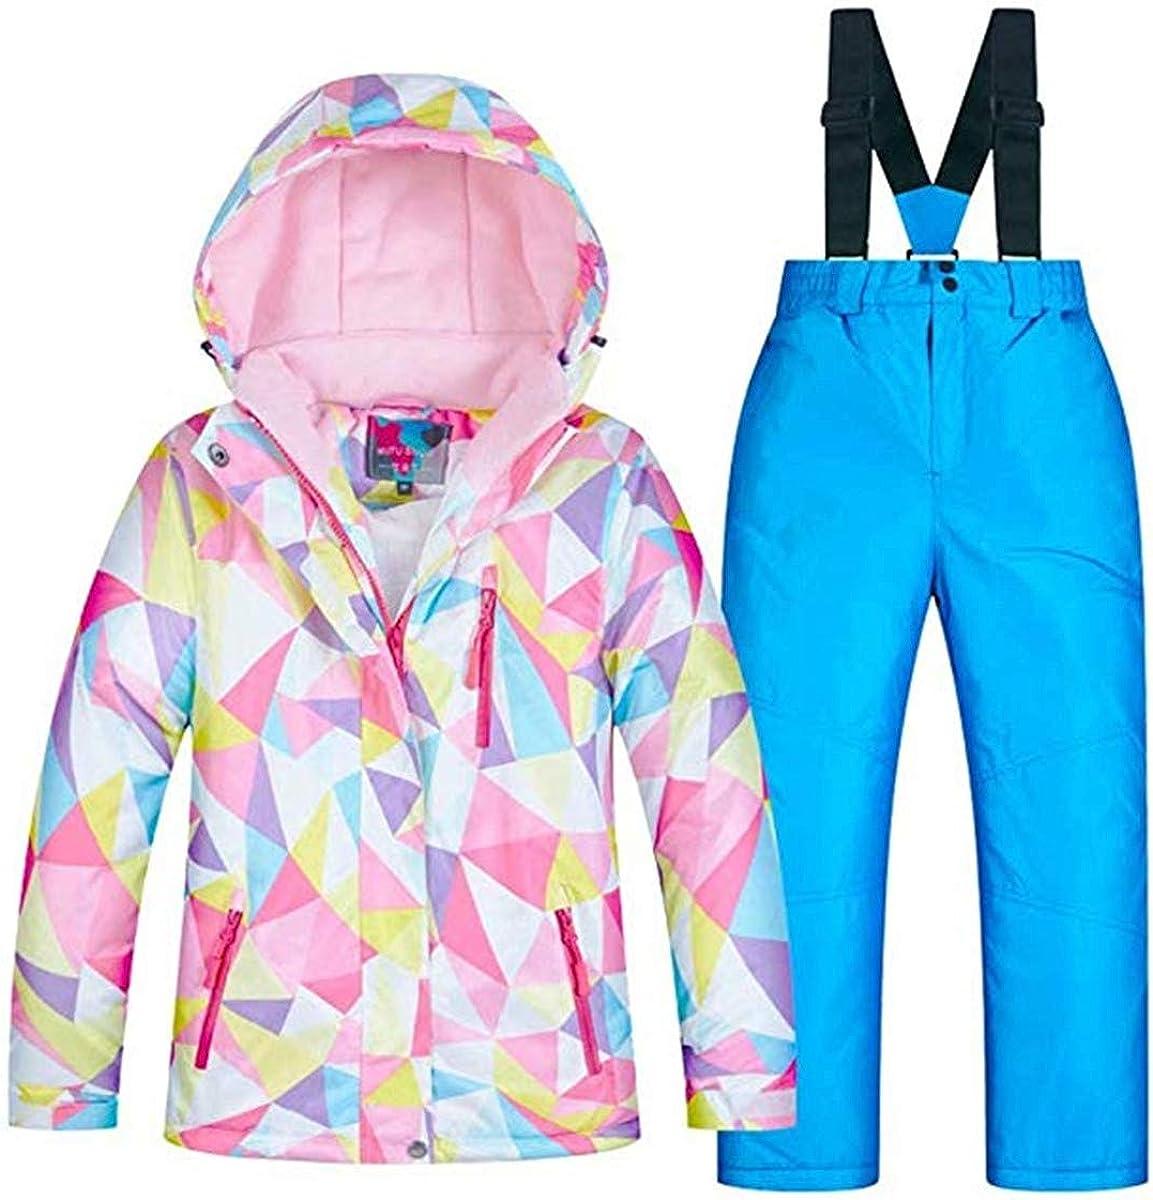 Little Girl's Outdoor Mountain Waterproof Windproof Ski Jacket Insulated Snowboarding Coatand Pants Snowsuit Set